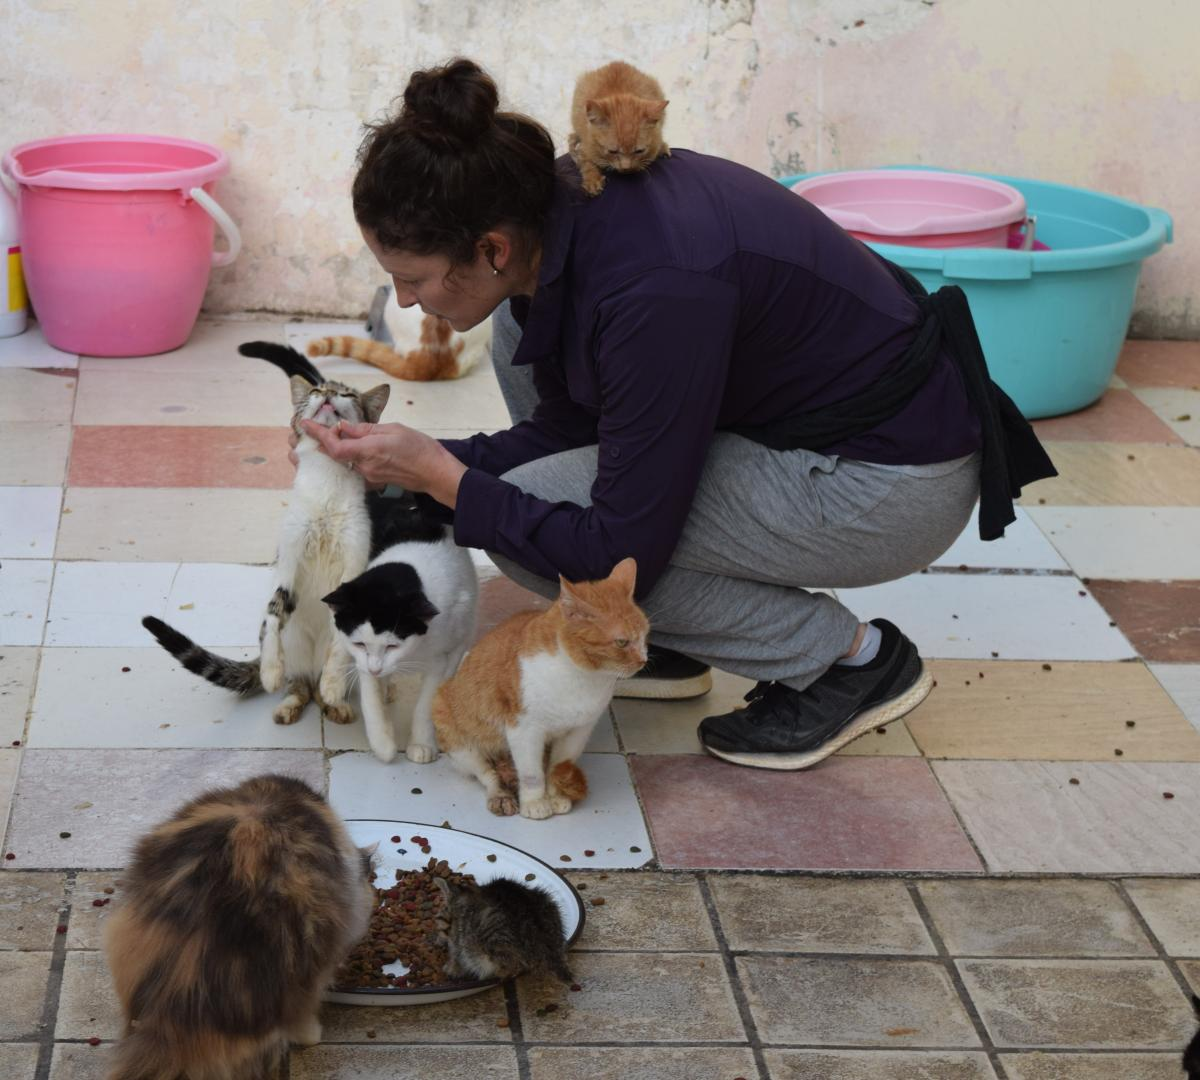 Volunteer Kaitlyn Schultz spends her Saturdays tending to some 50 cats on this Rabat rooftop.